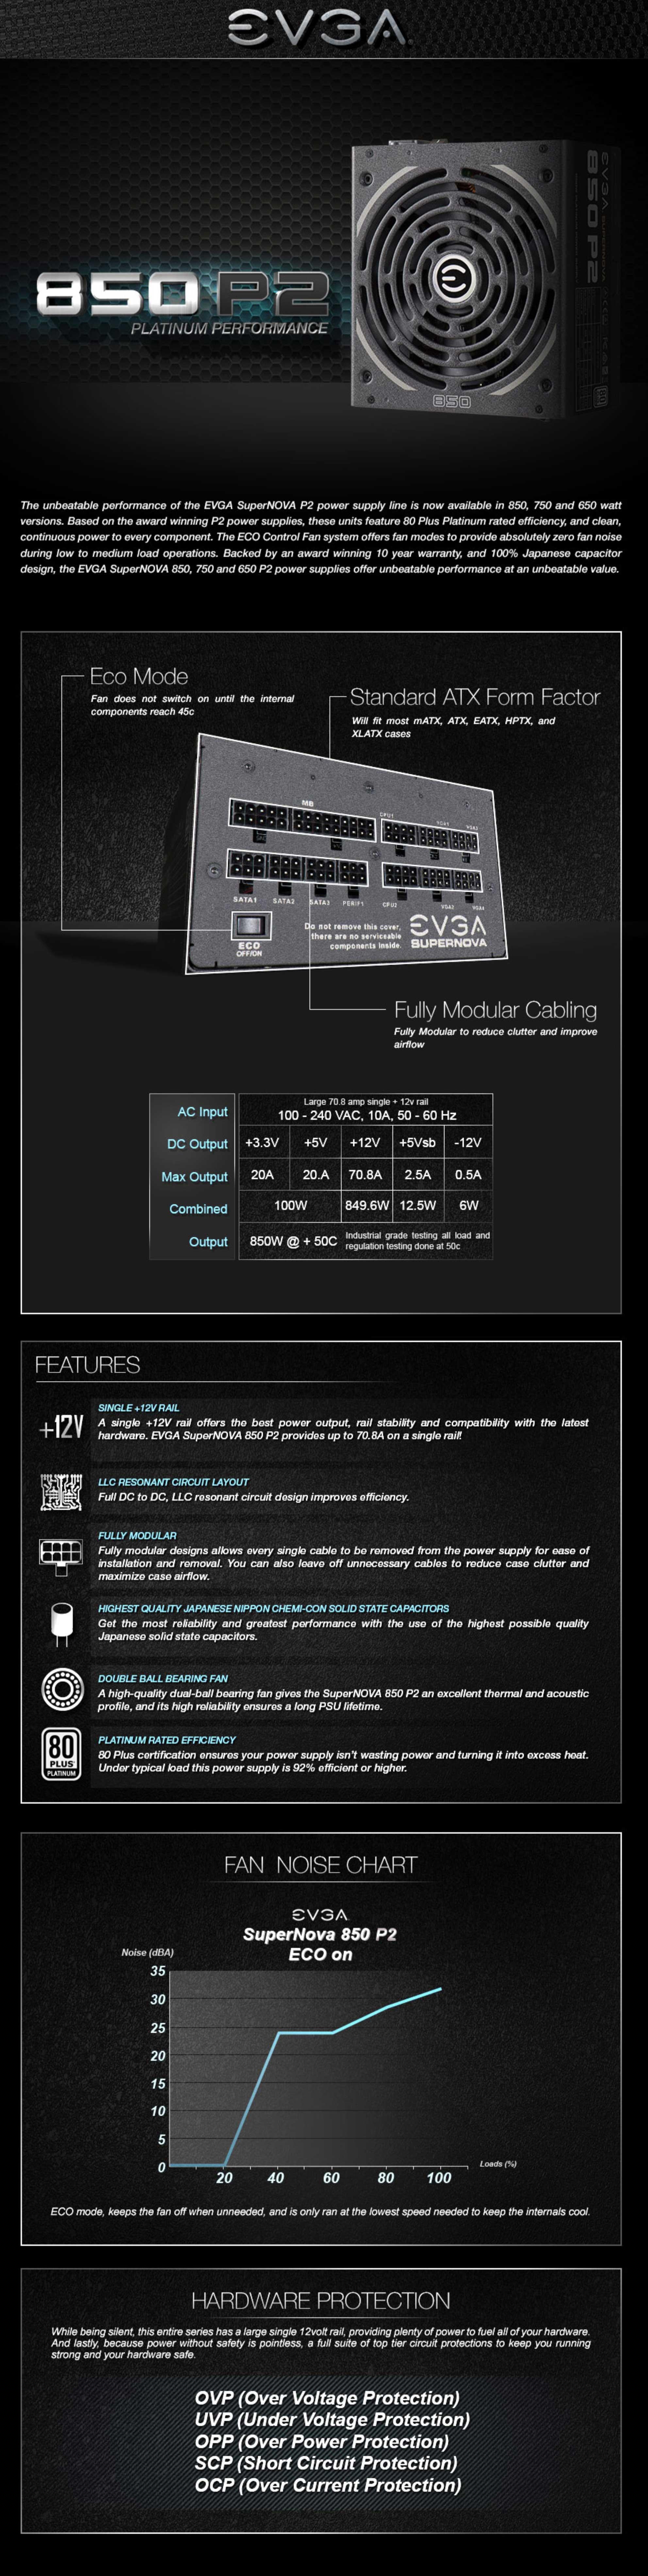 screencapture-au-evga-products-product-aspx-2020-01-22-13_19_53.jpg